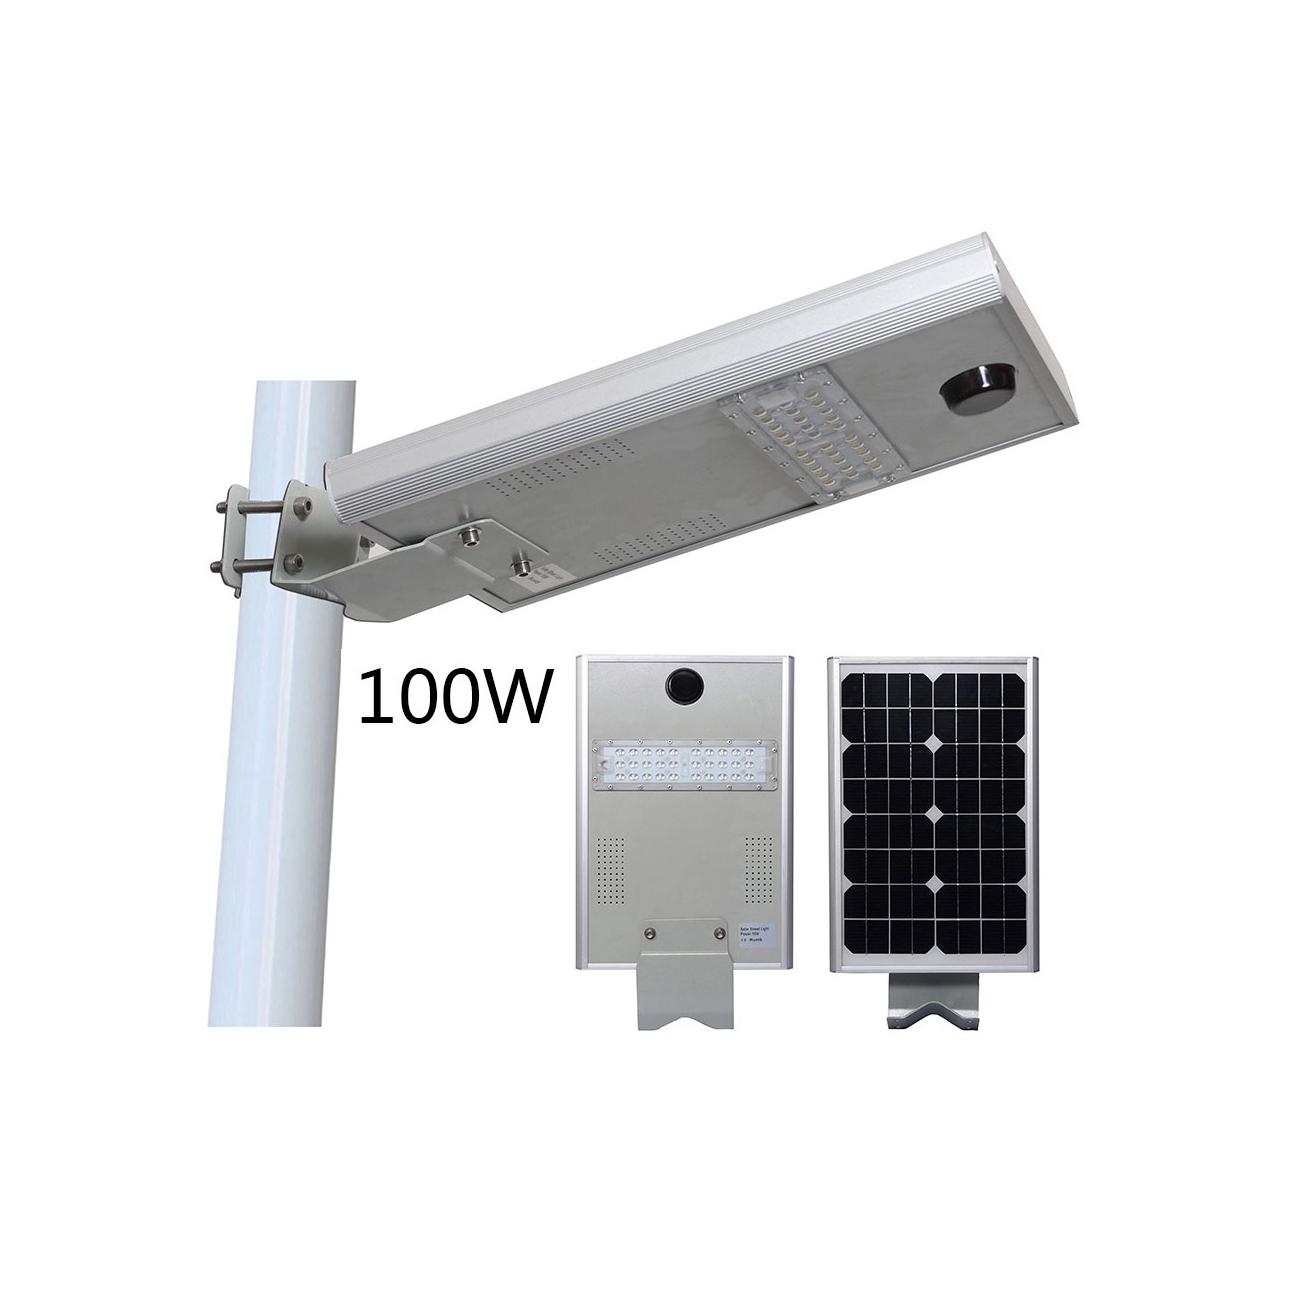 China Zhongshan famous brand manufacturer led solar street light